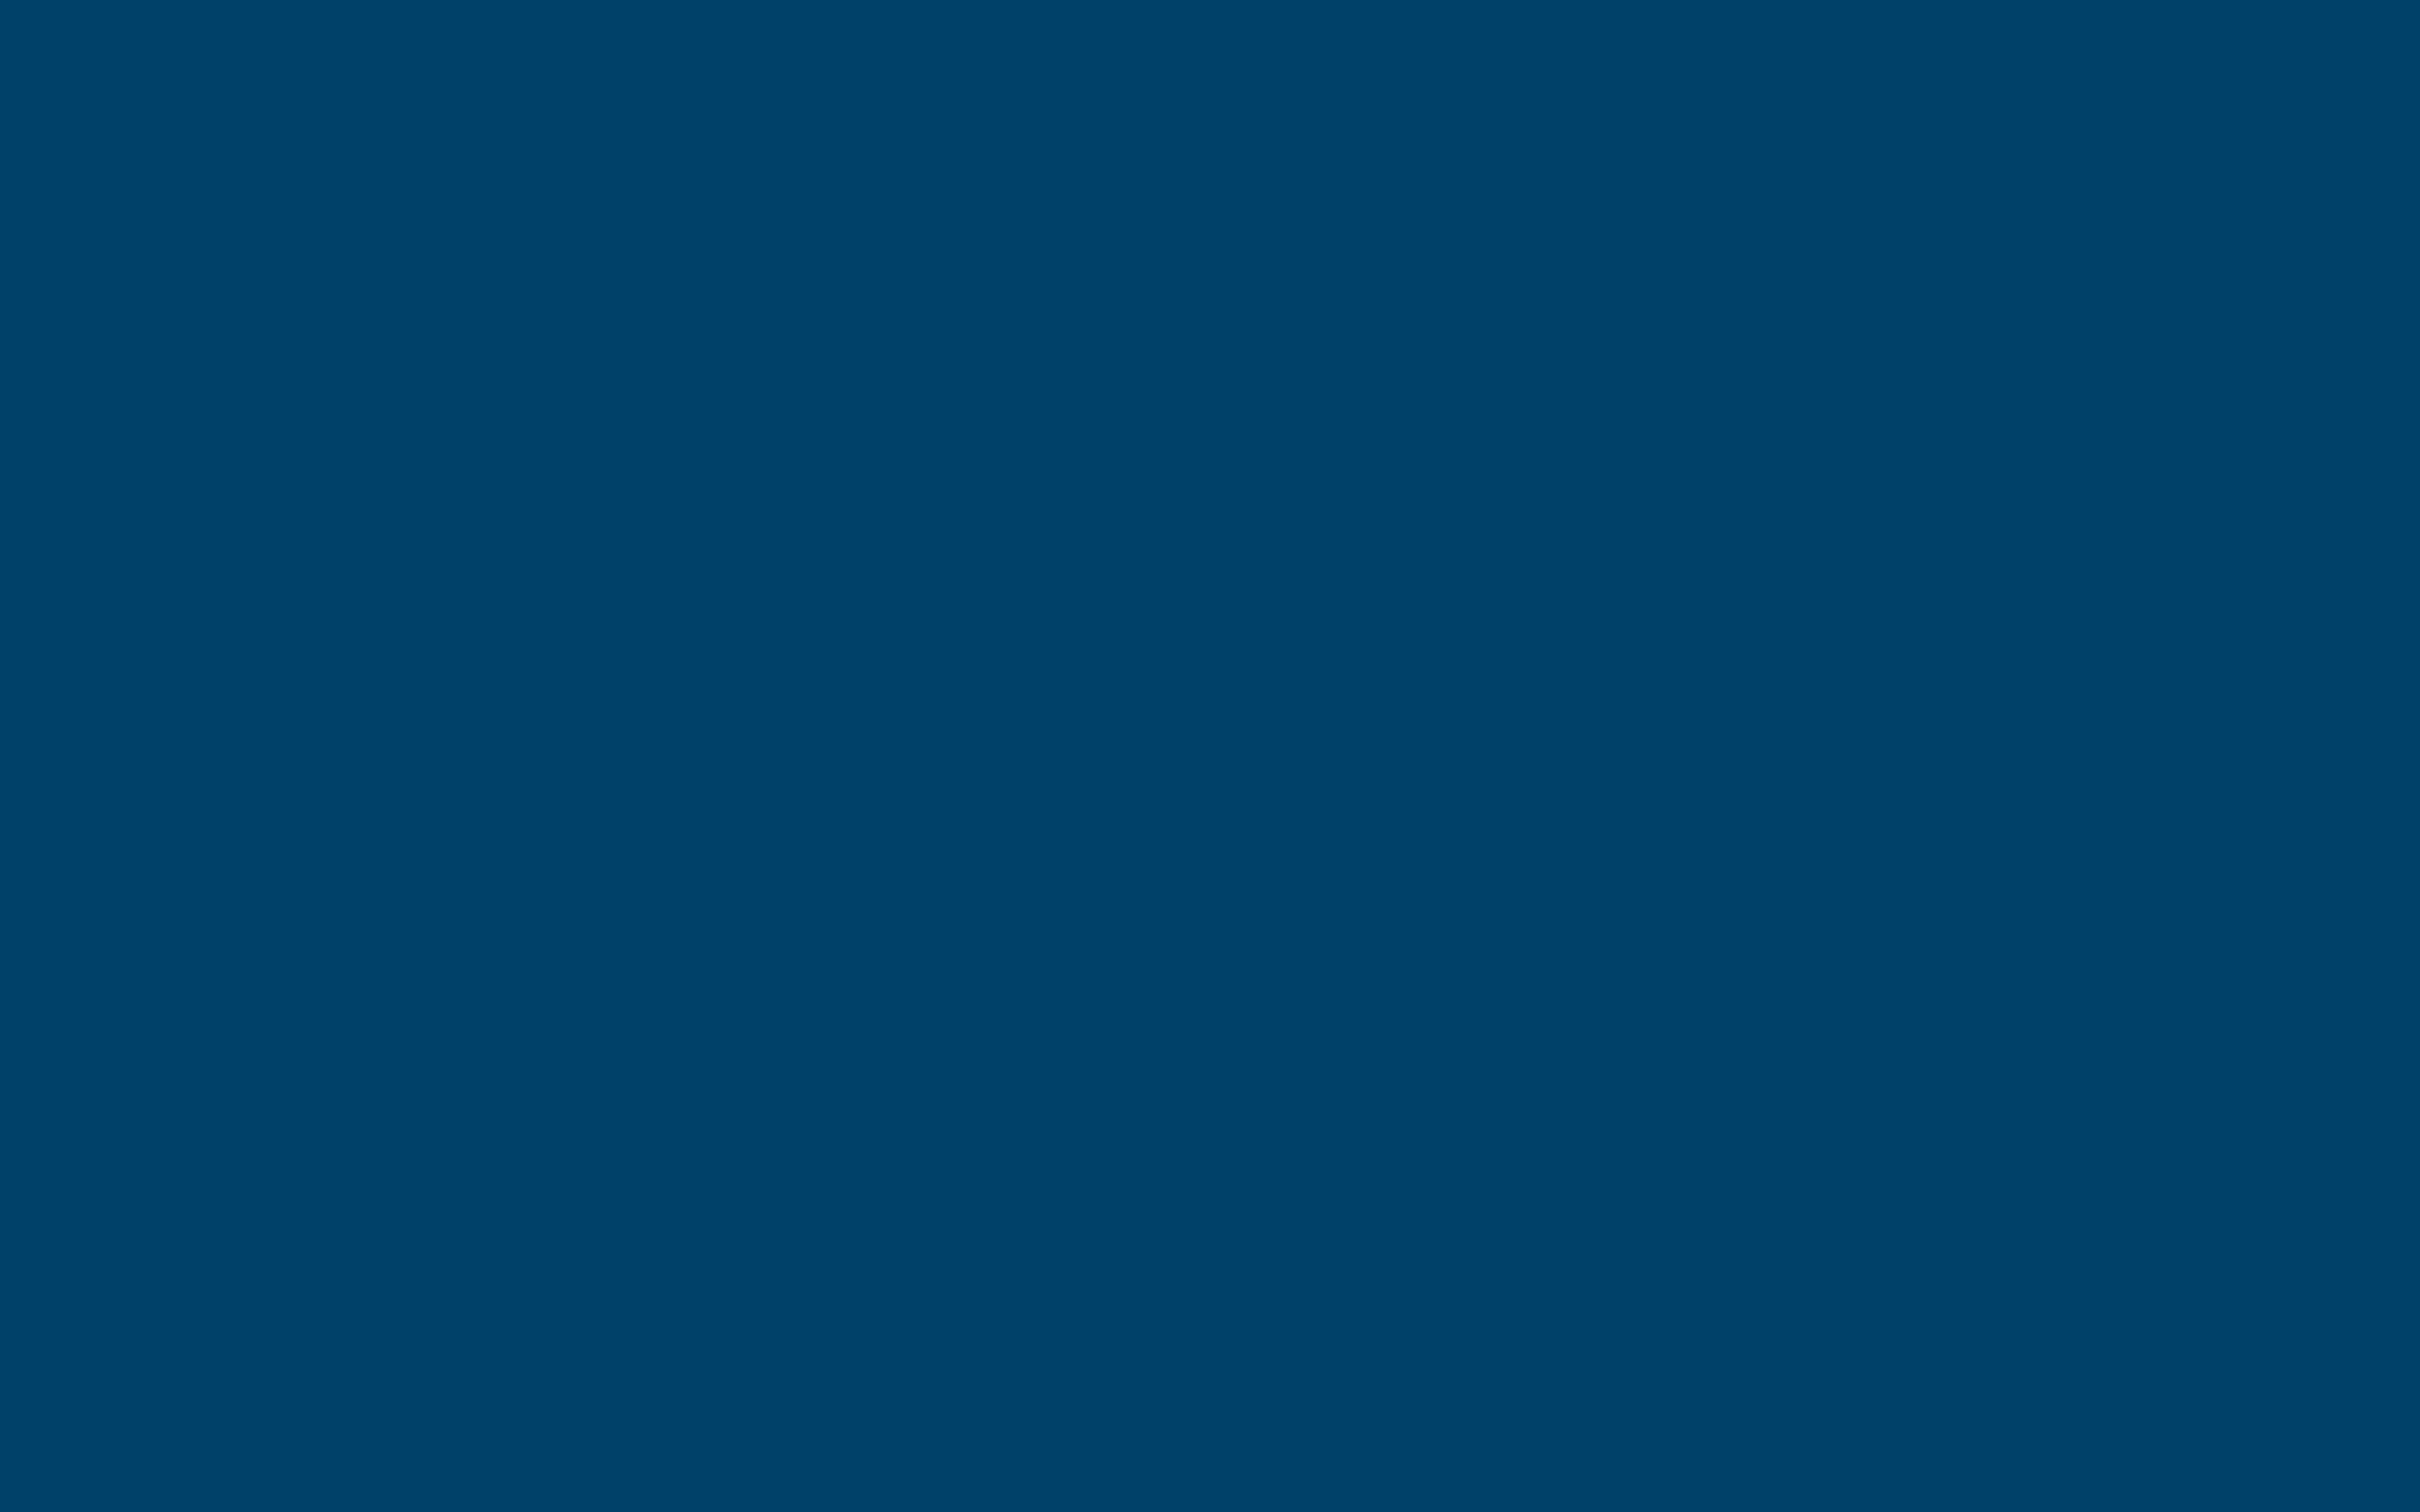 Uncategorized What Color Is Indigo indigo dye solid color background  2560x1600 background